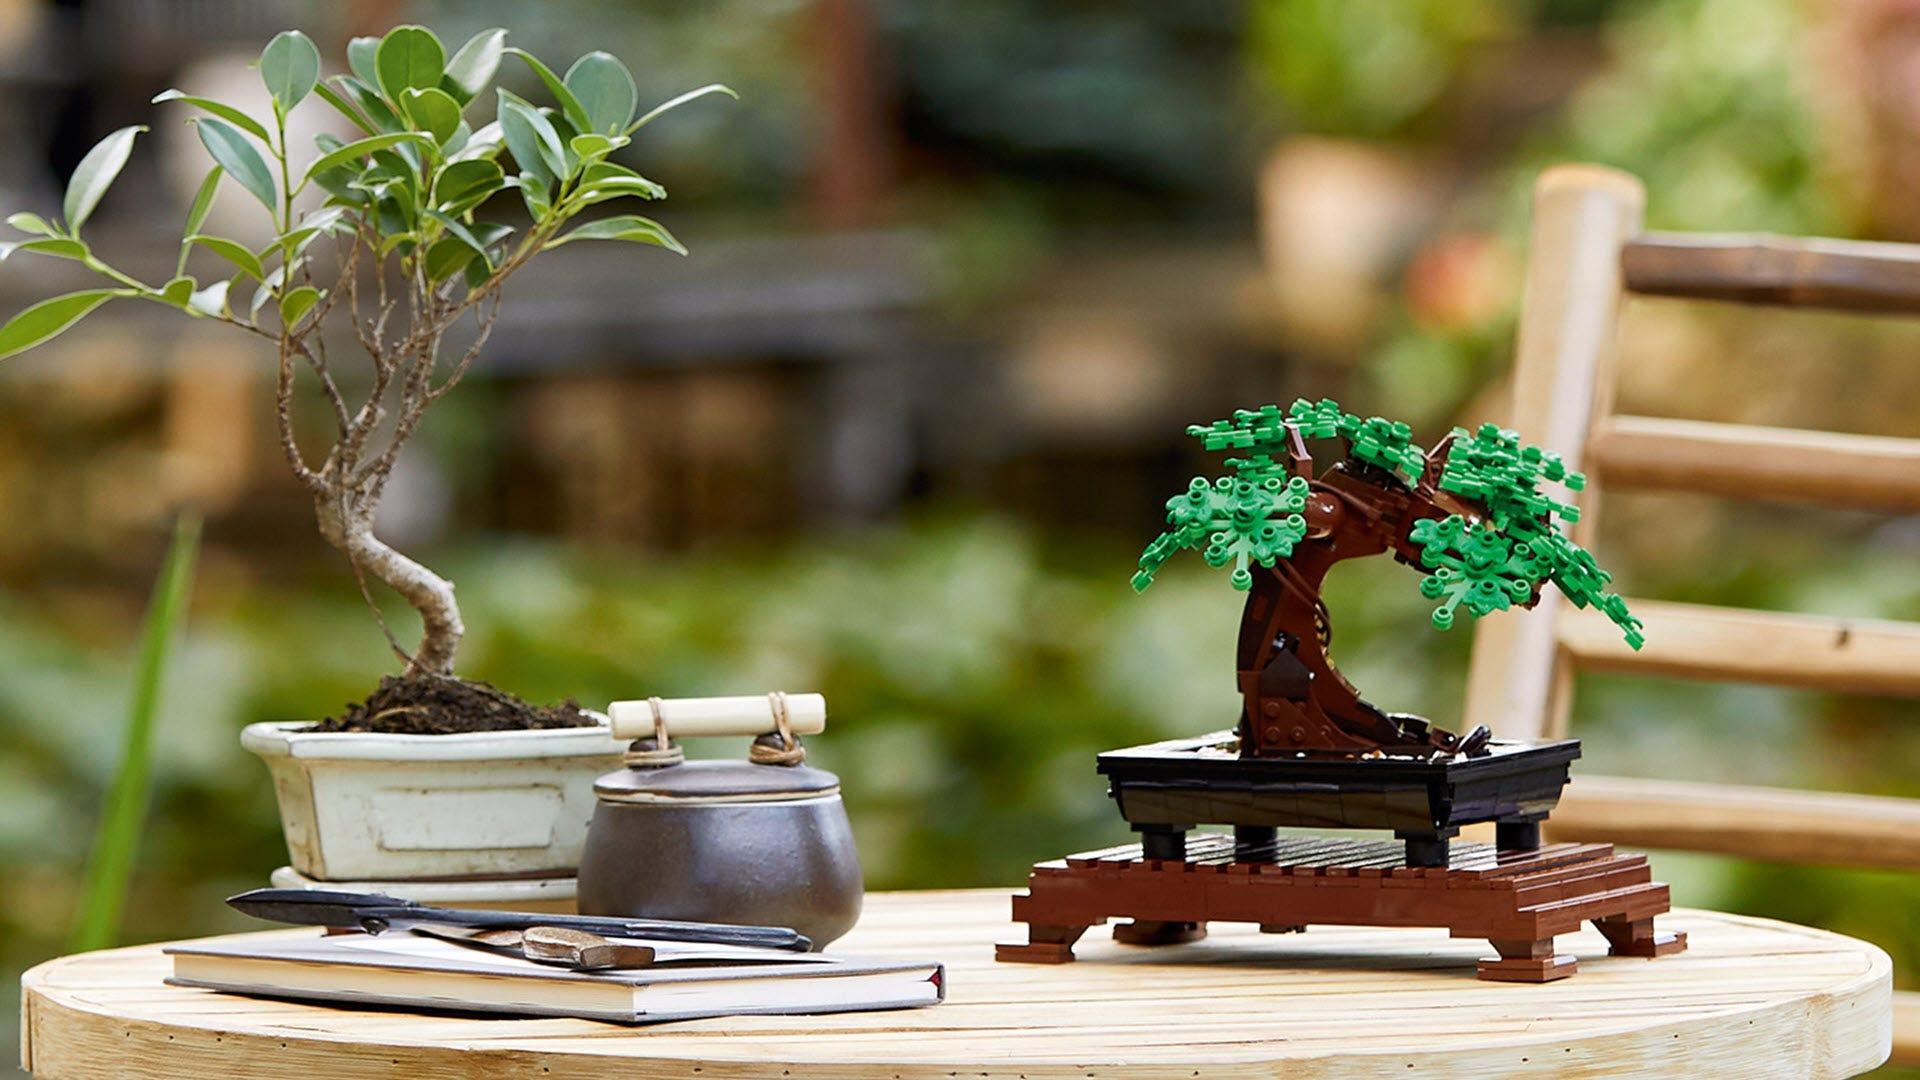 A LEGO bonsai tree next to a real bonsai tree.